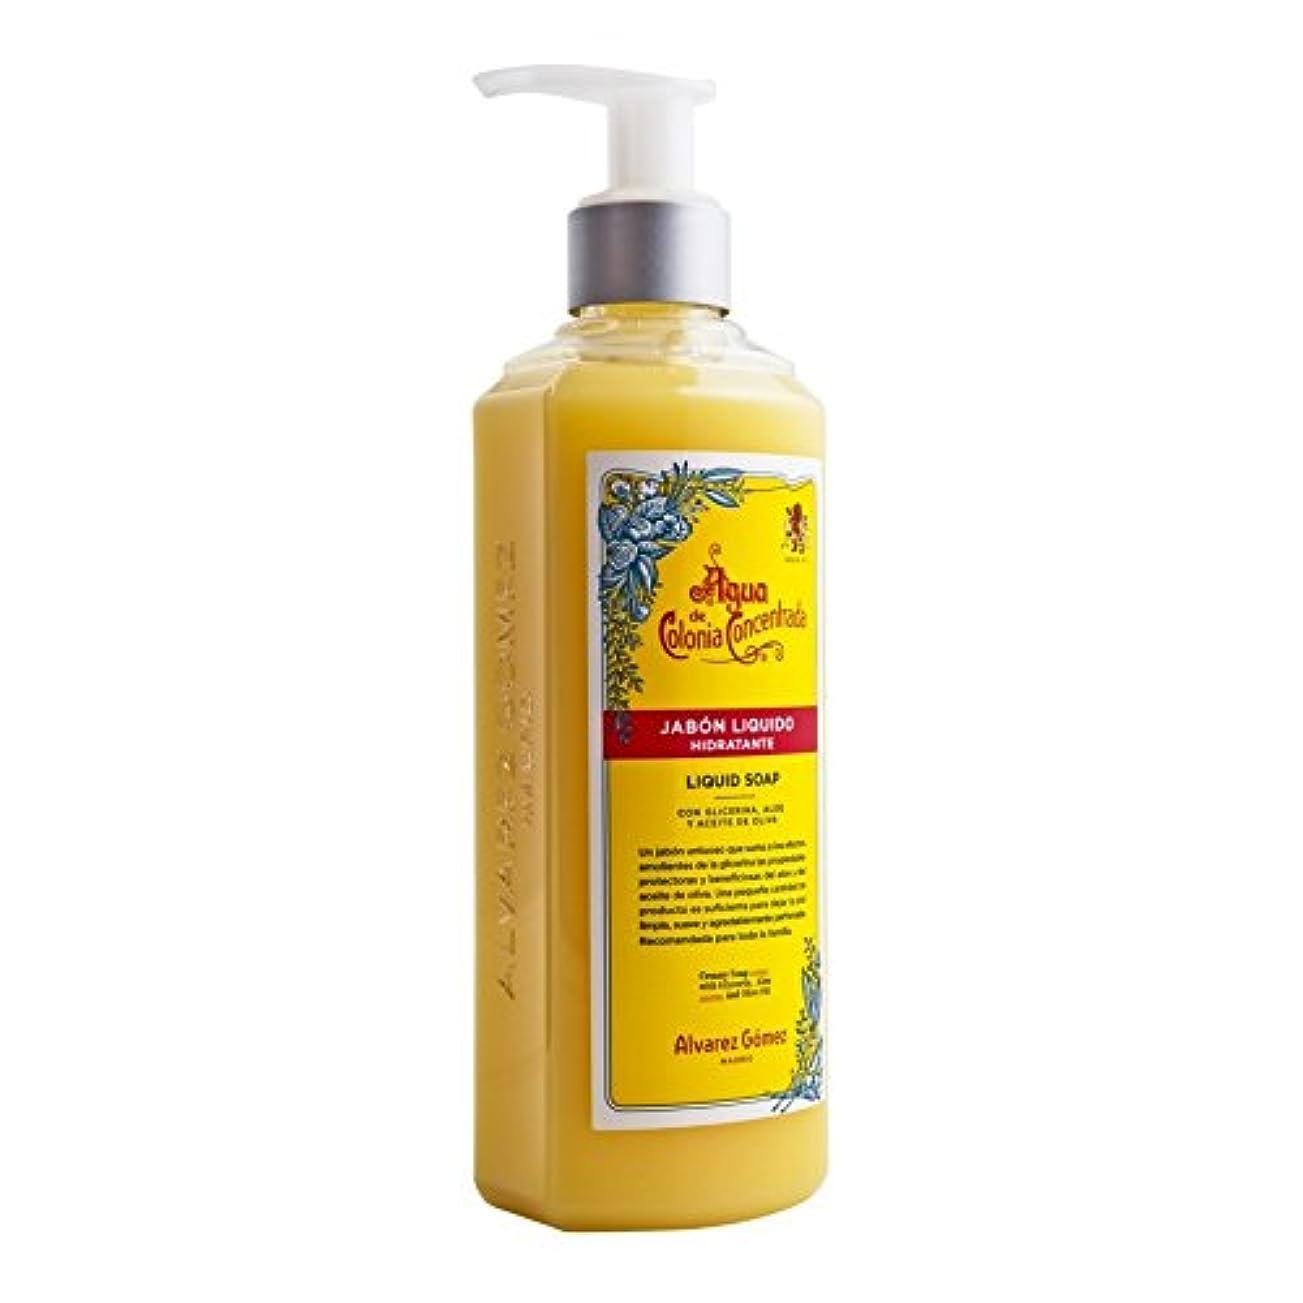 ?lvarez G?mez Agua de Colonia Concentrada Liquid Soap 300ml - アルバレスゴメスアグアデコロニ液体石鹸300ミリリットル [並行輸入品]